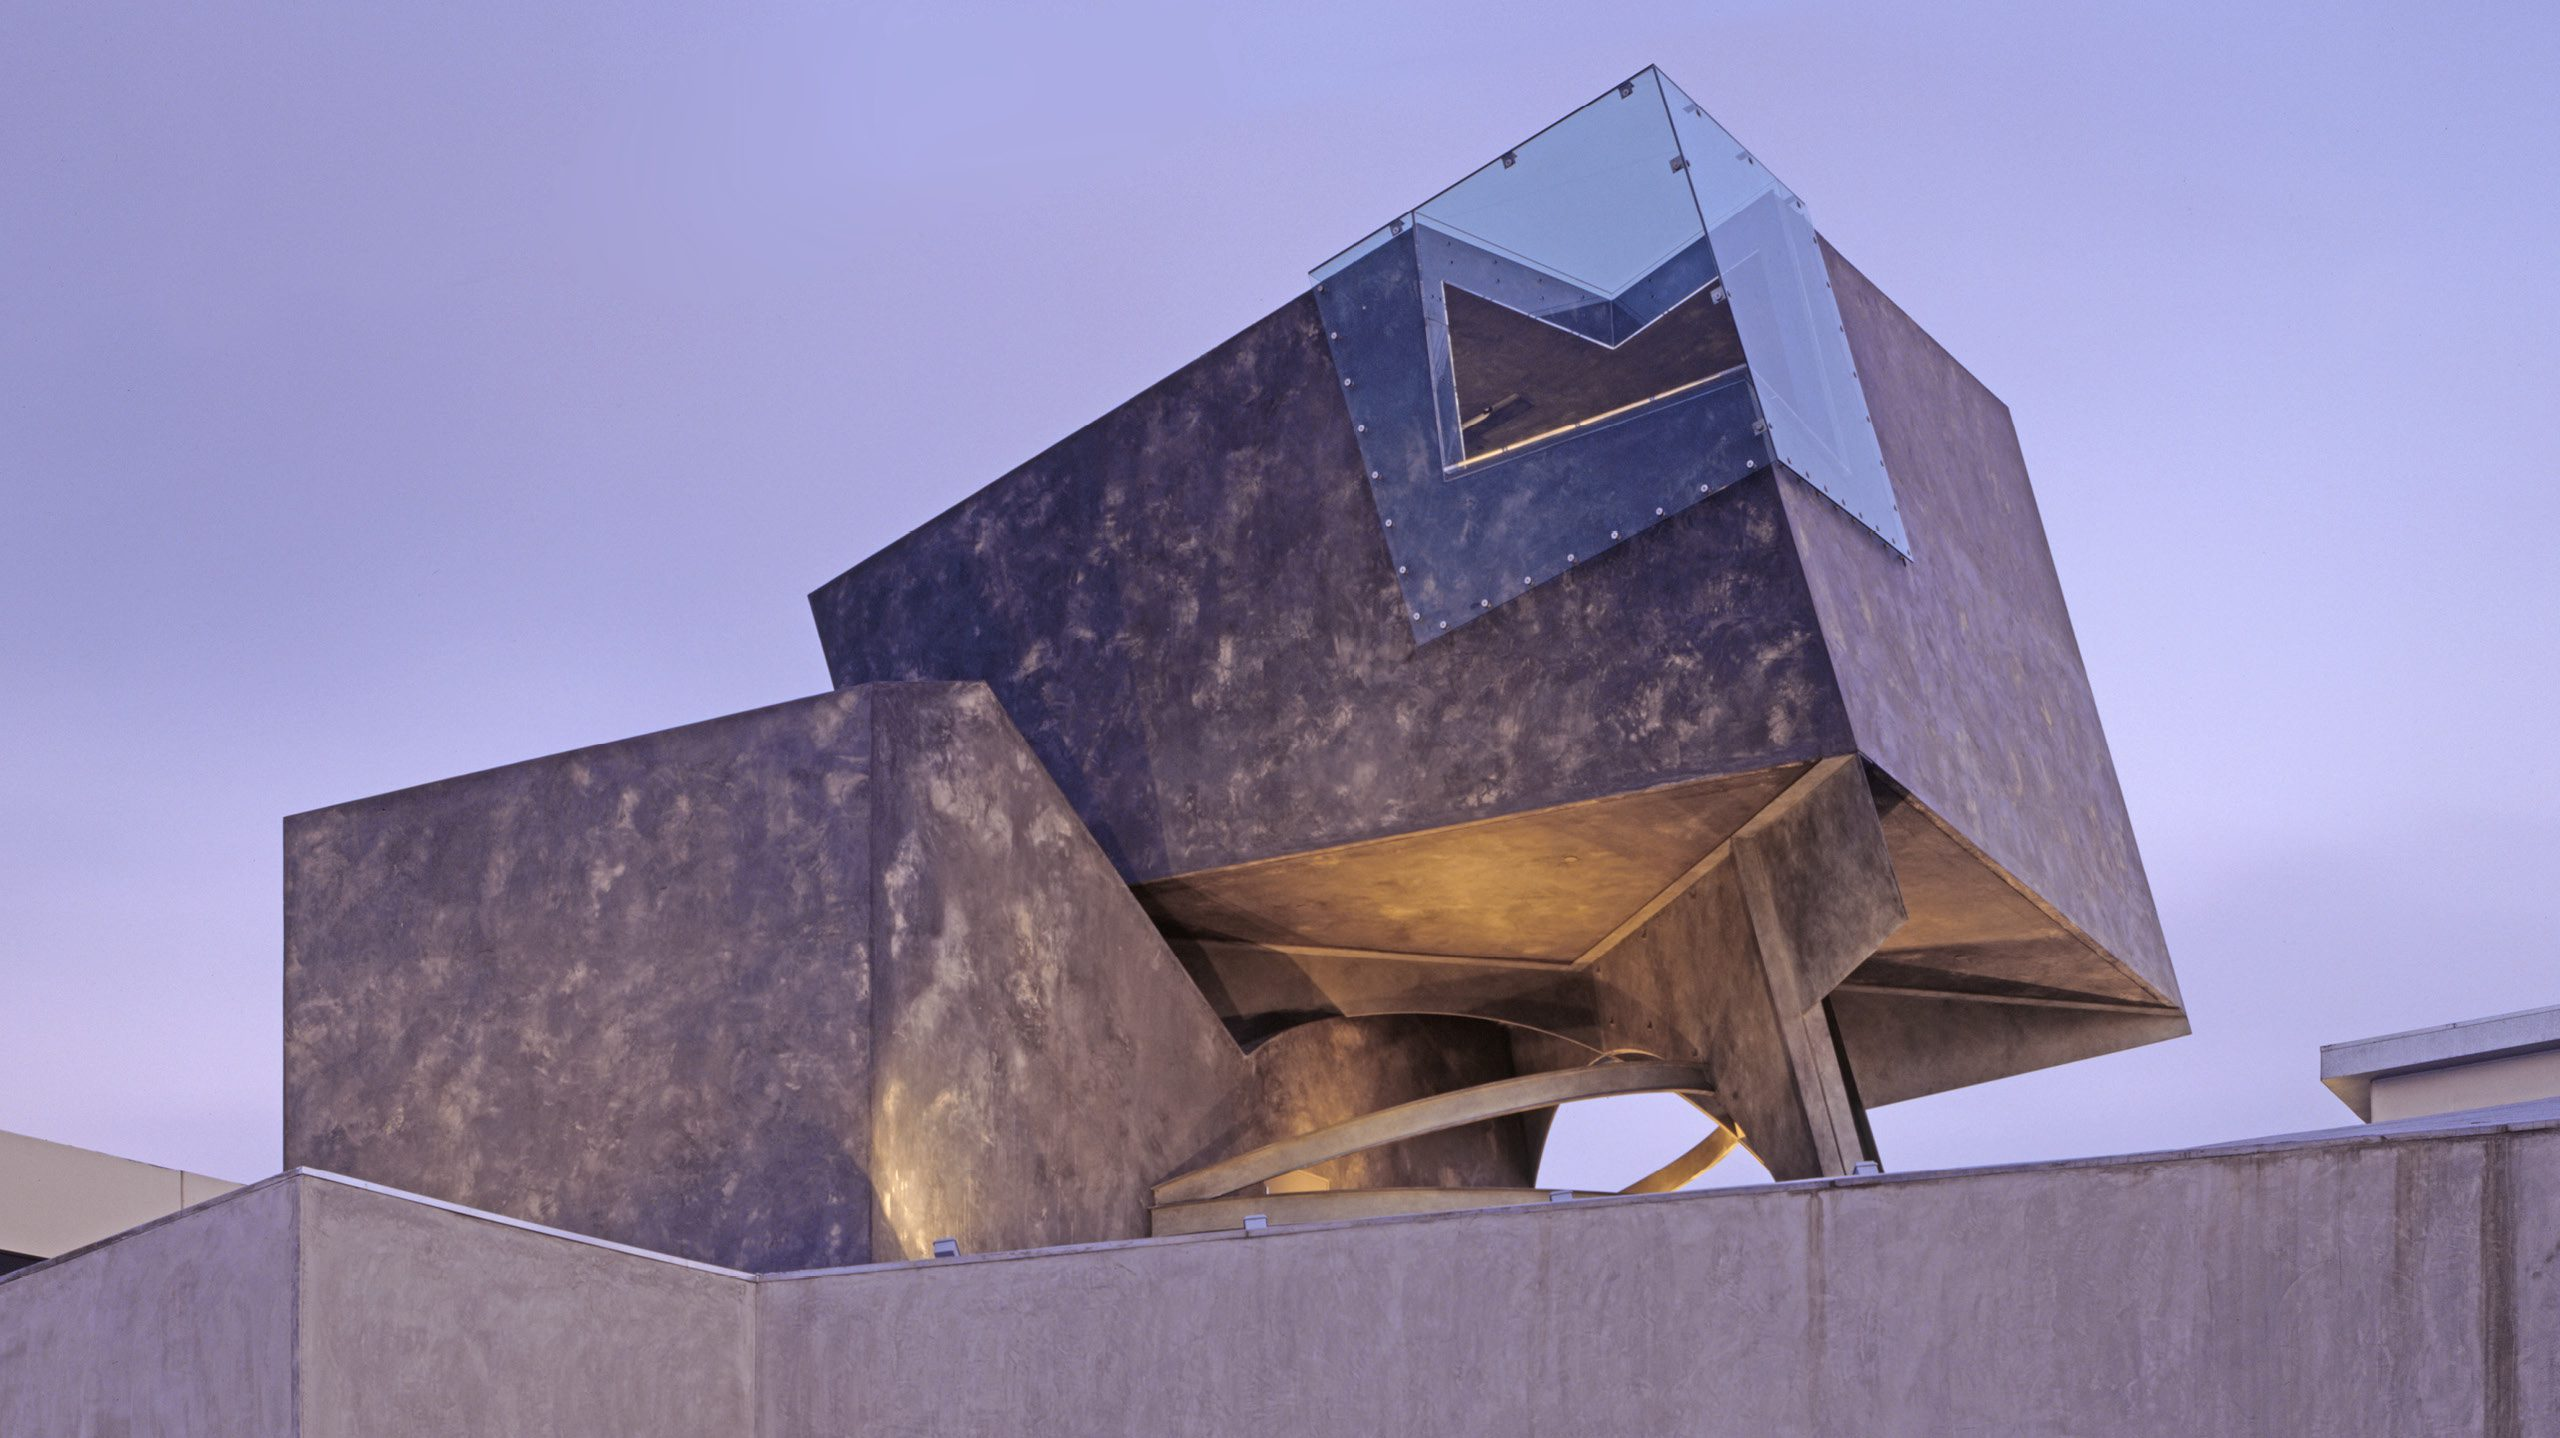 The Box Eric Owen Moss Architects